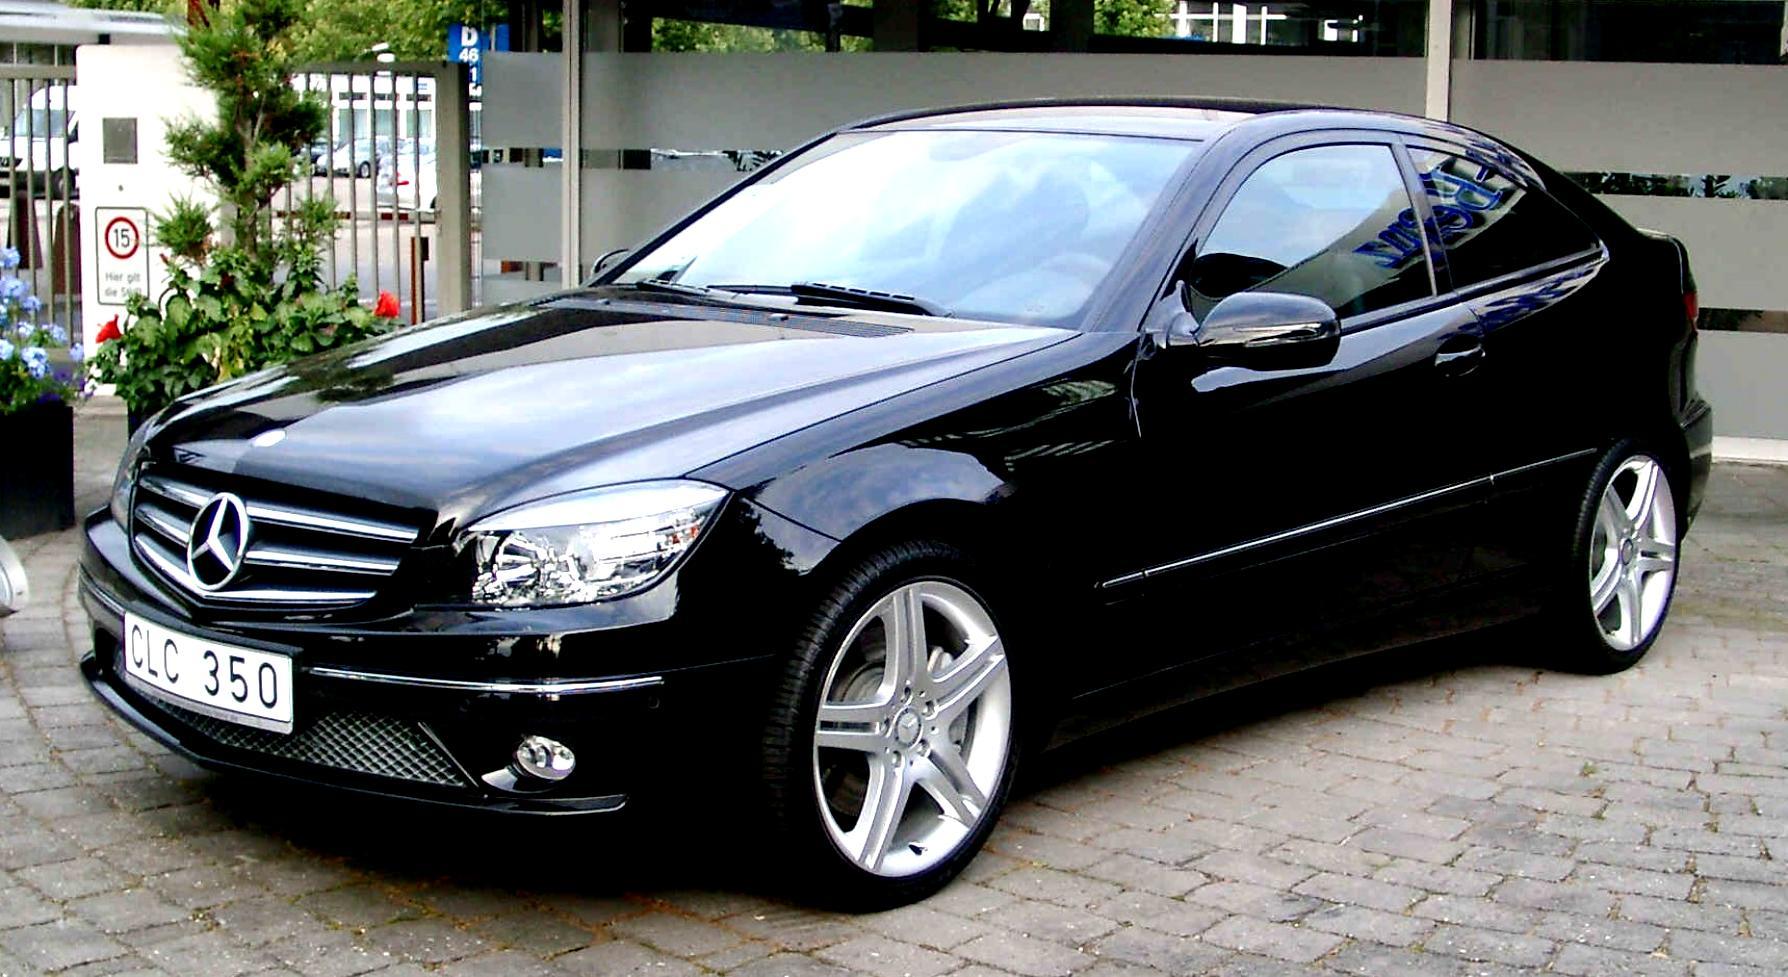 Mercedes Benz Clk Cabrio A208 1998 further 193897 likewise Mercedes Benz Clk Cabrio A208 1998 furthermore 0 199 moreover Mercedes Benz Clc W203 2008. on mercedes benz clk cabrio a208 1998